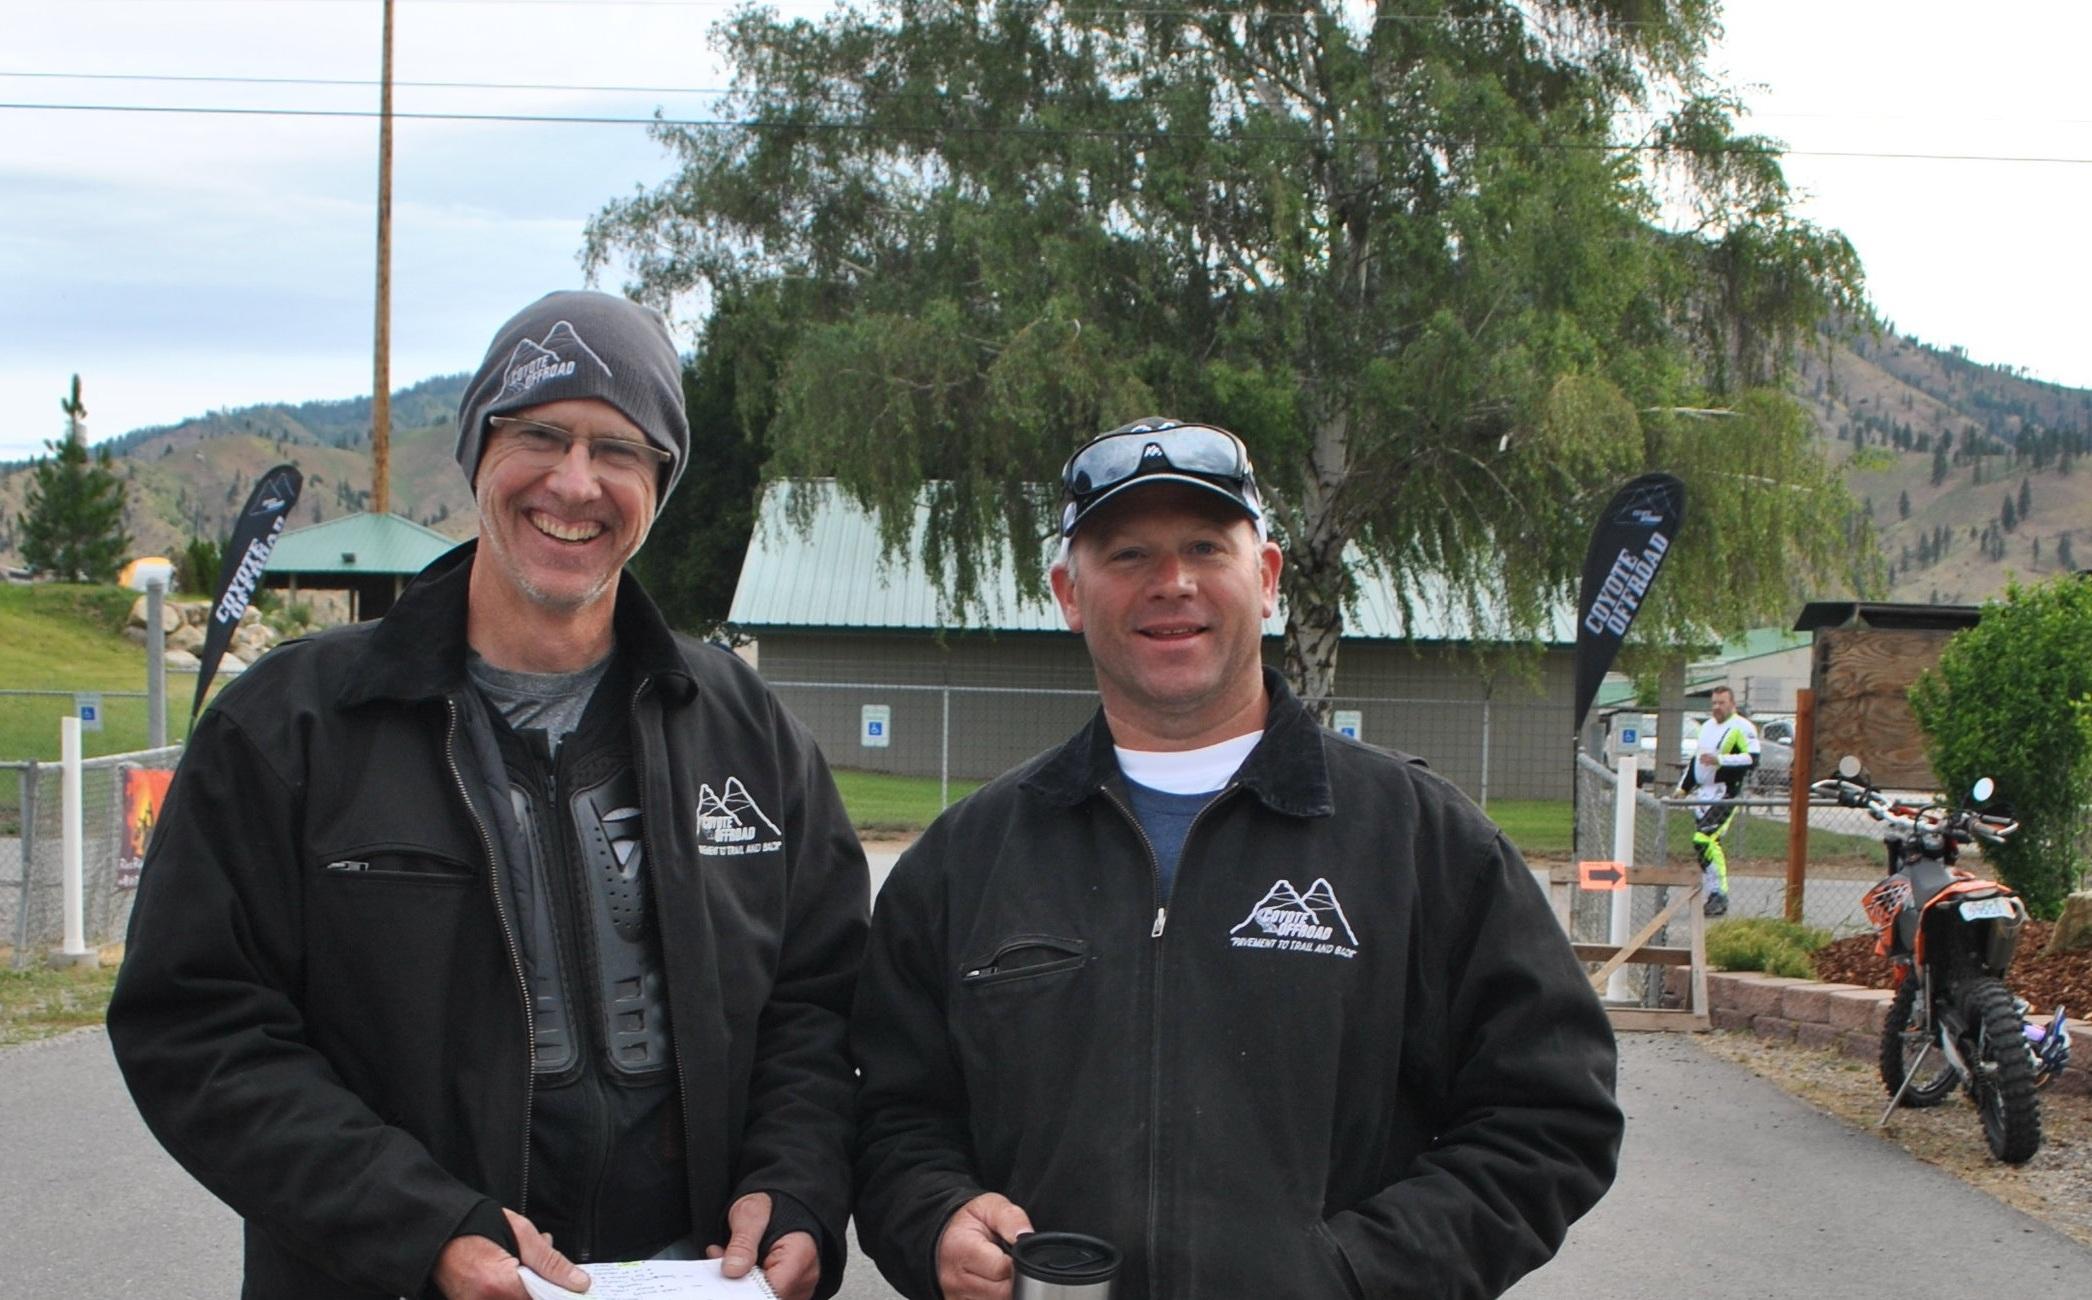 Meet the Owners - Lane Keller and Jerod Kitchel